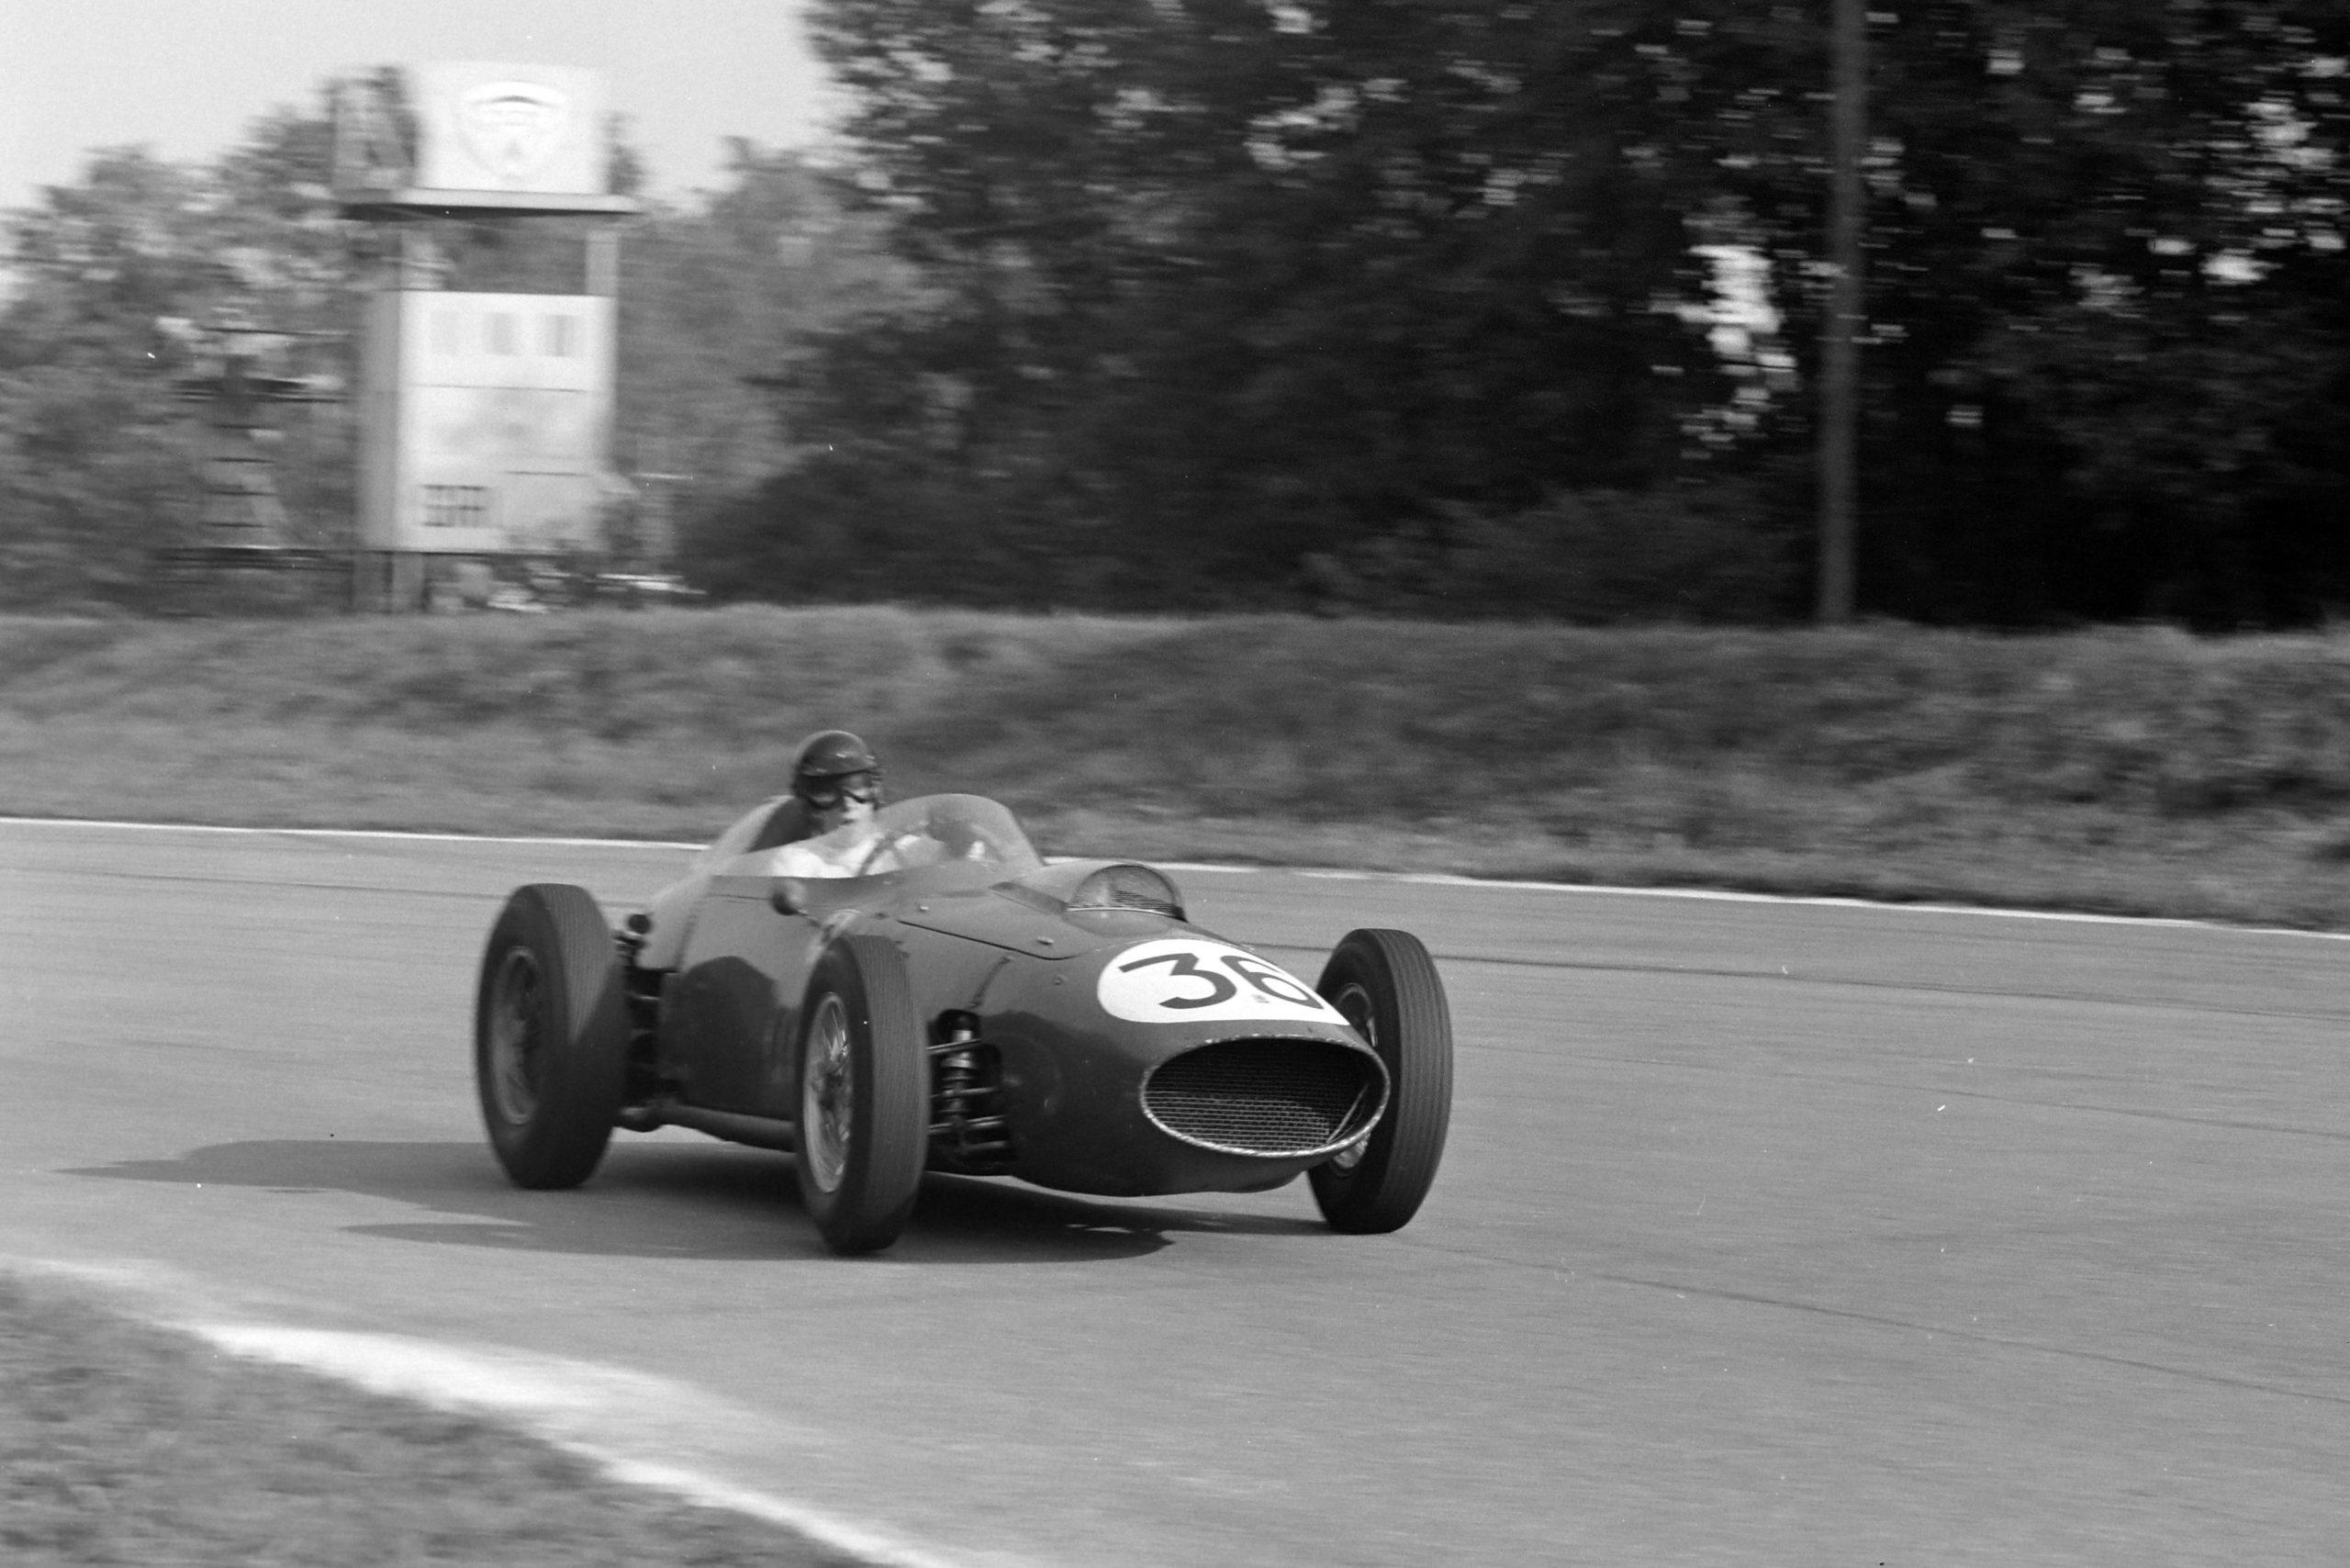 Dan Gurney driving a Ferrari 246.